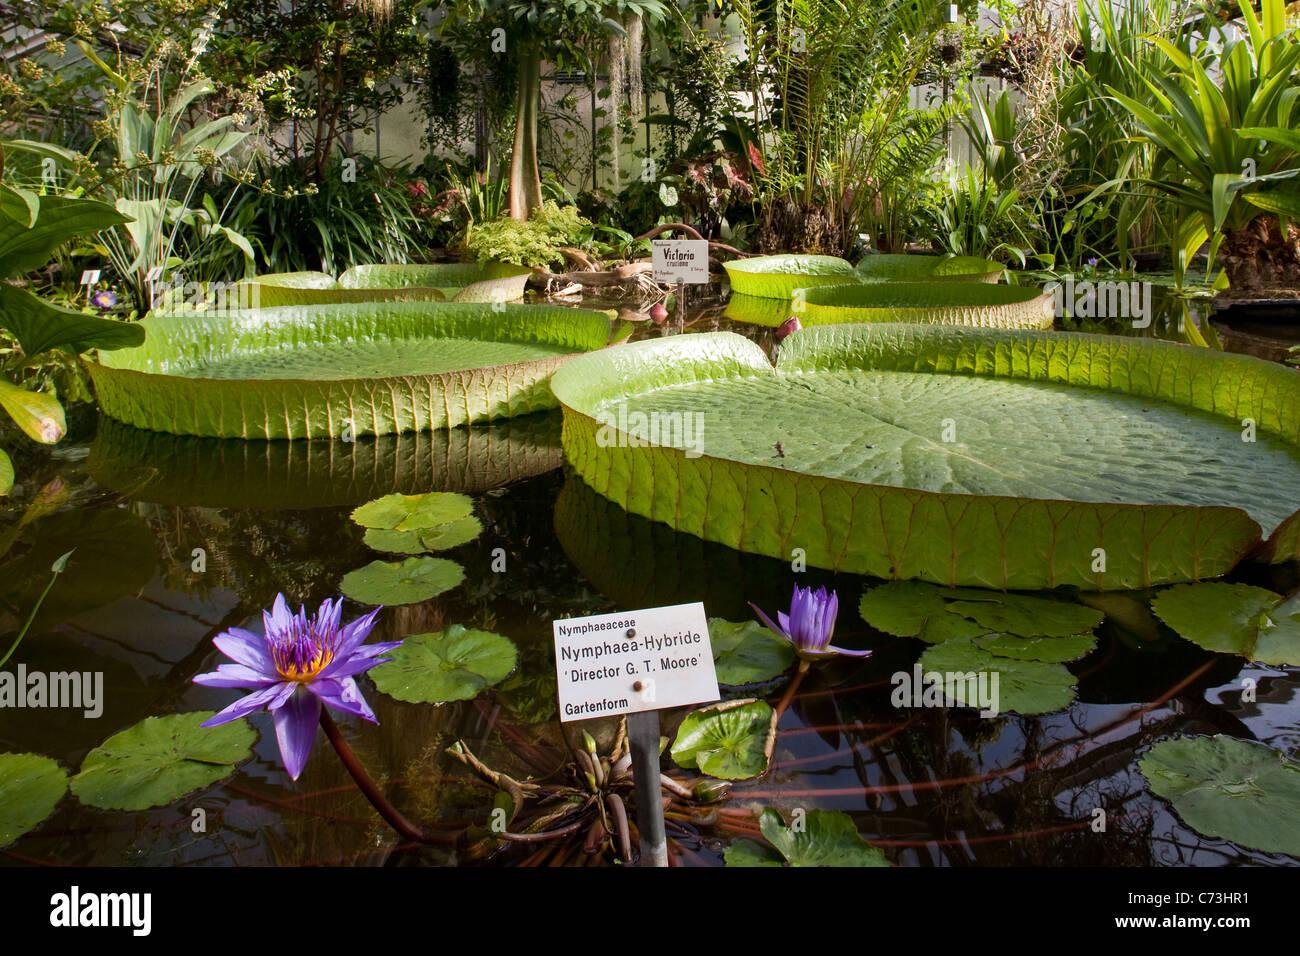 Seerosen Im Victoria Haus In Göttingen Botanischer Garten Göttingen